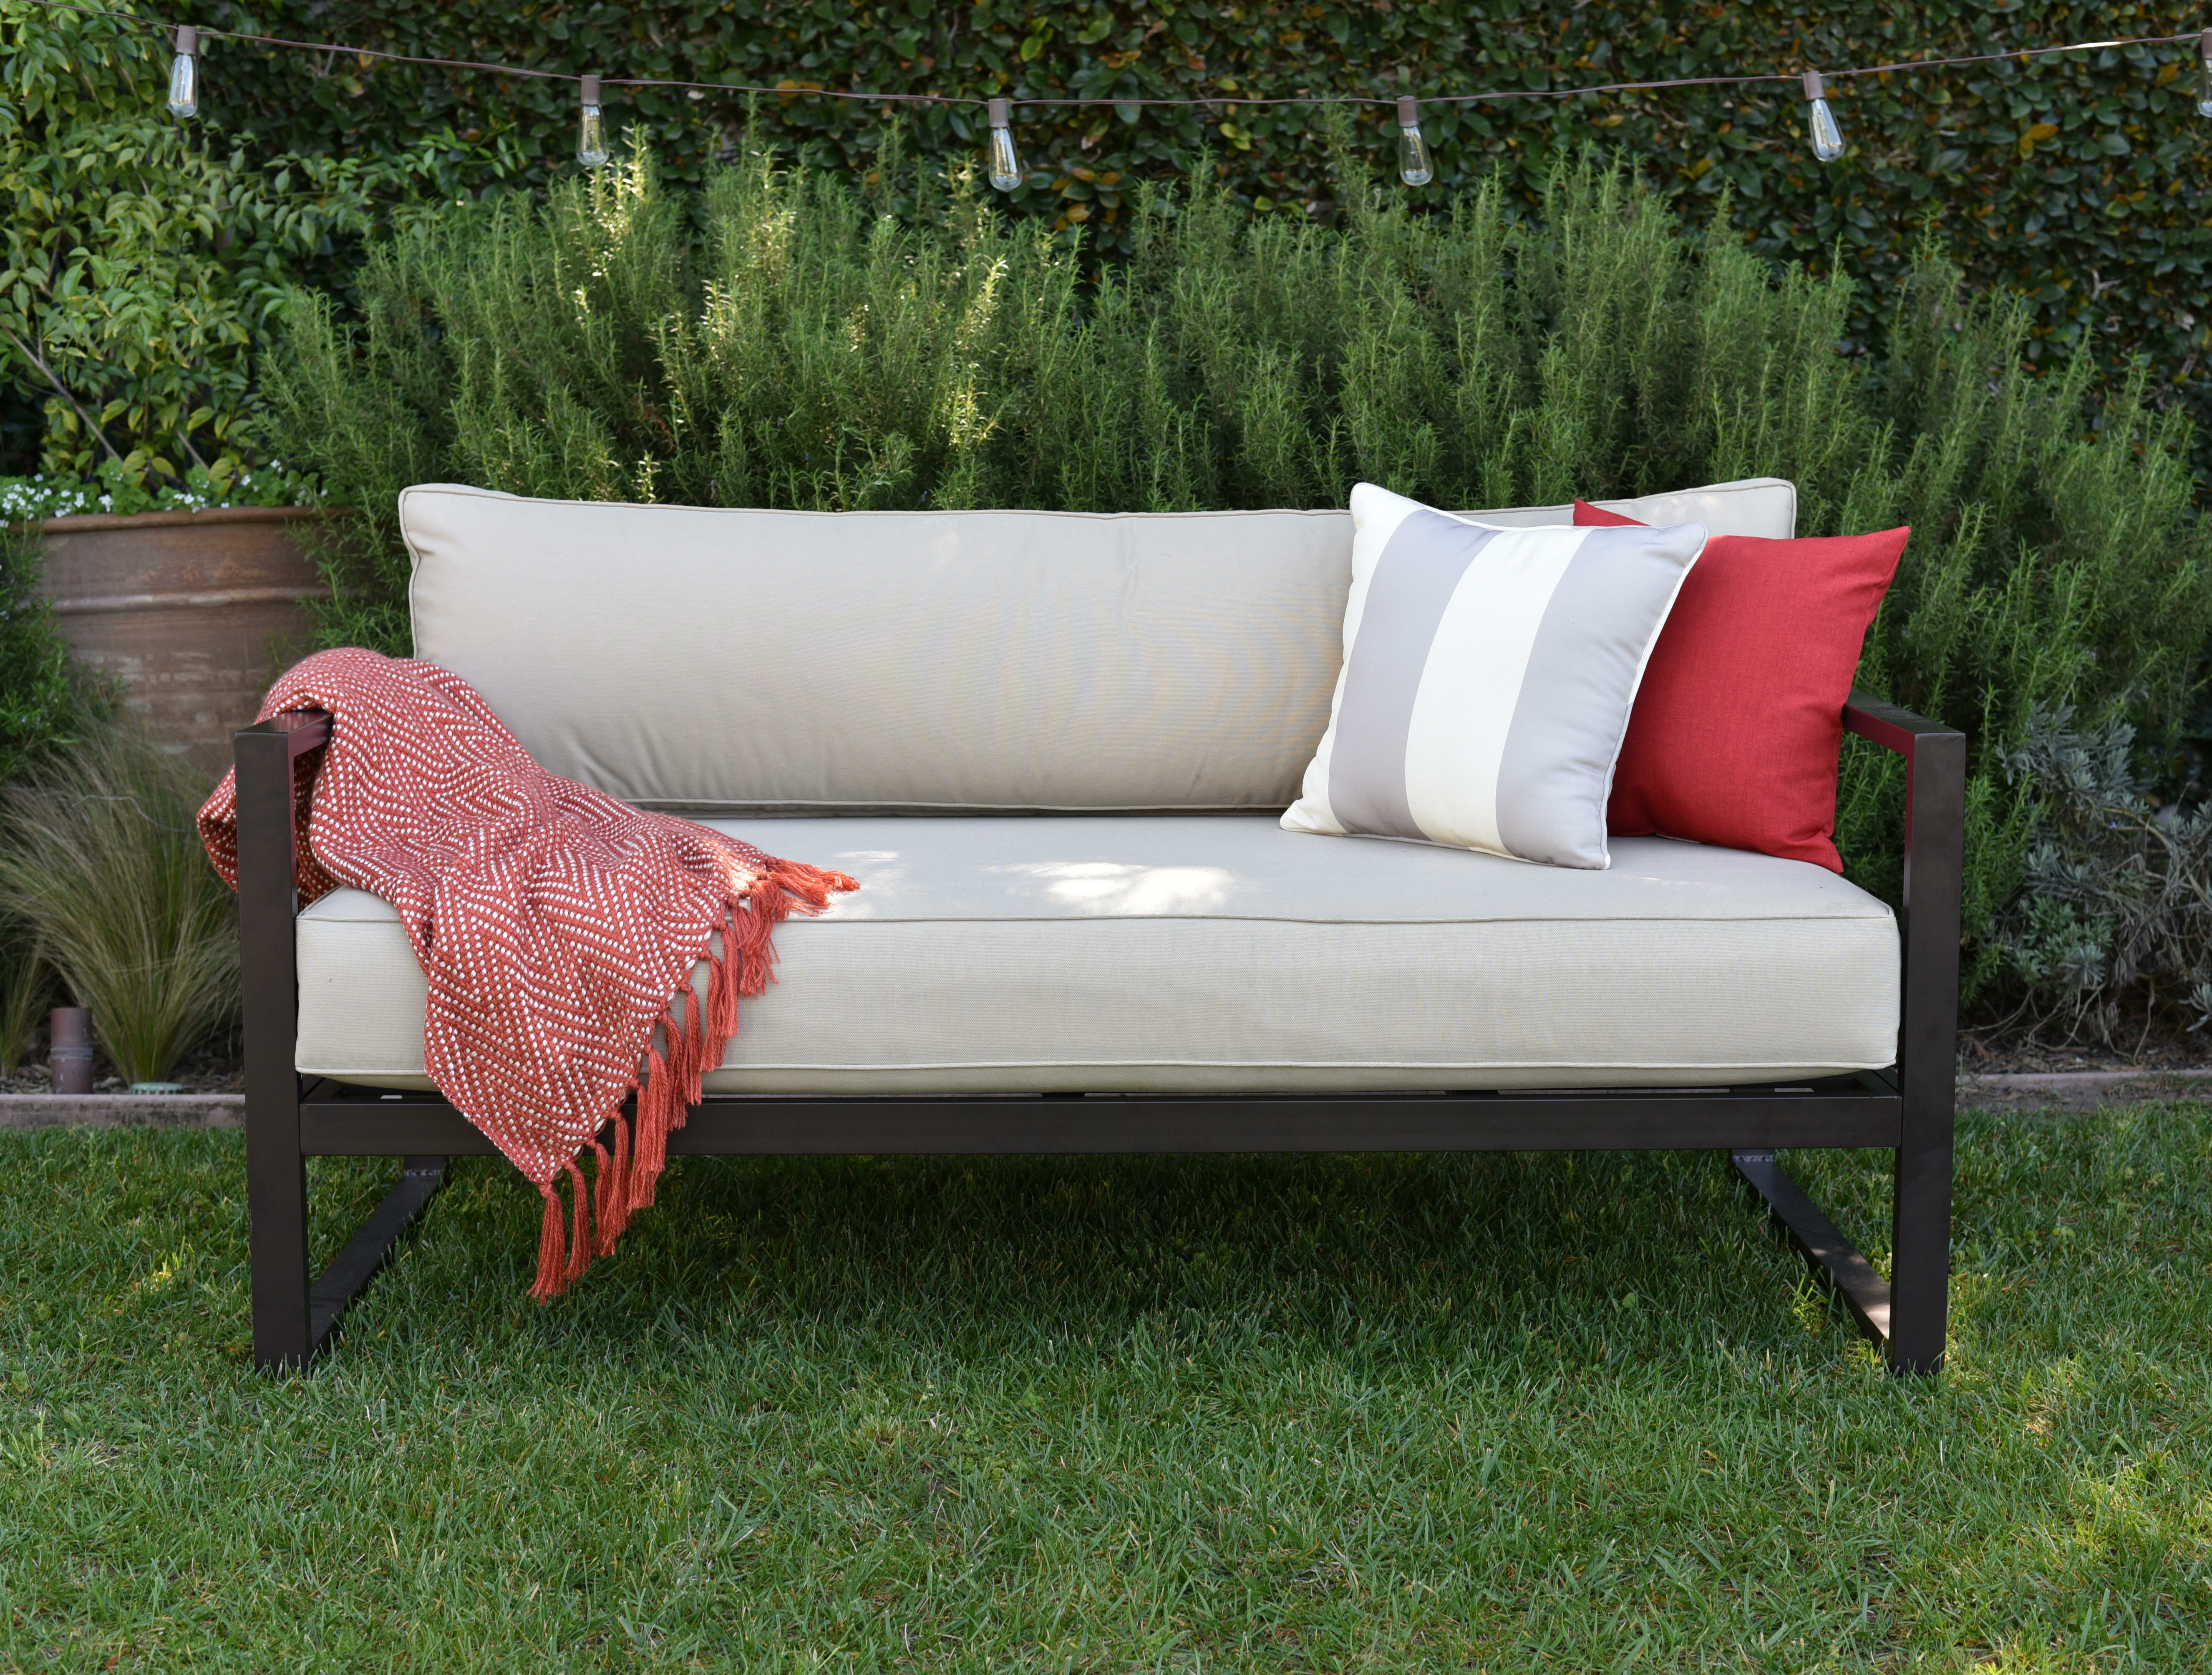 Wayfair | Serta at Home Catalina Outdoor Sofa with Cushions